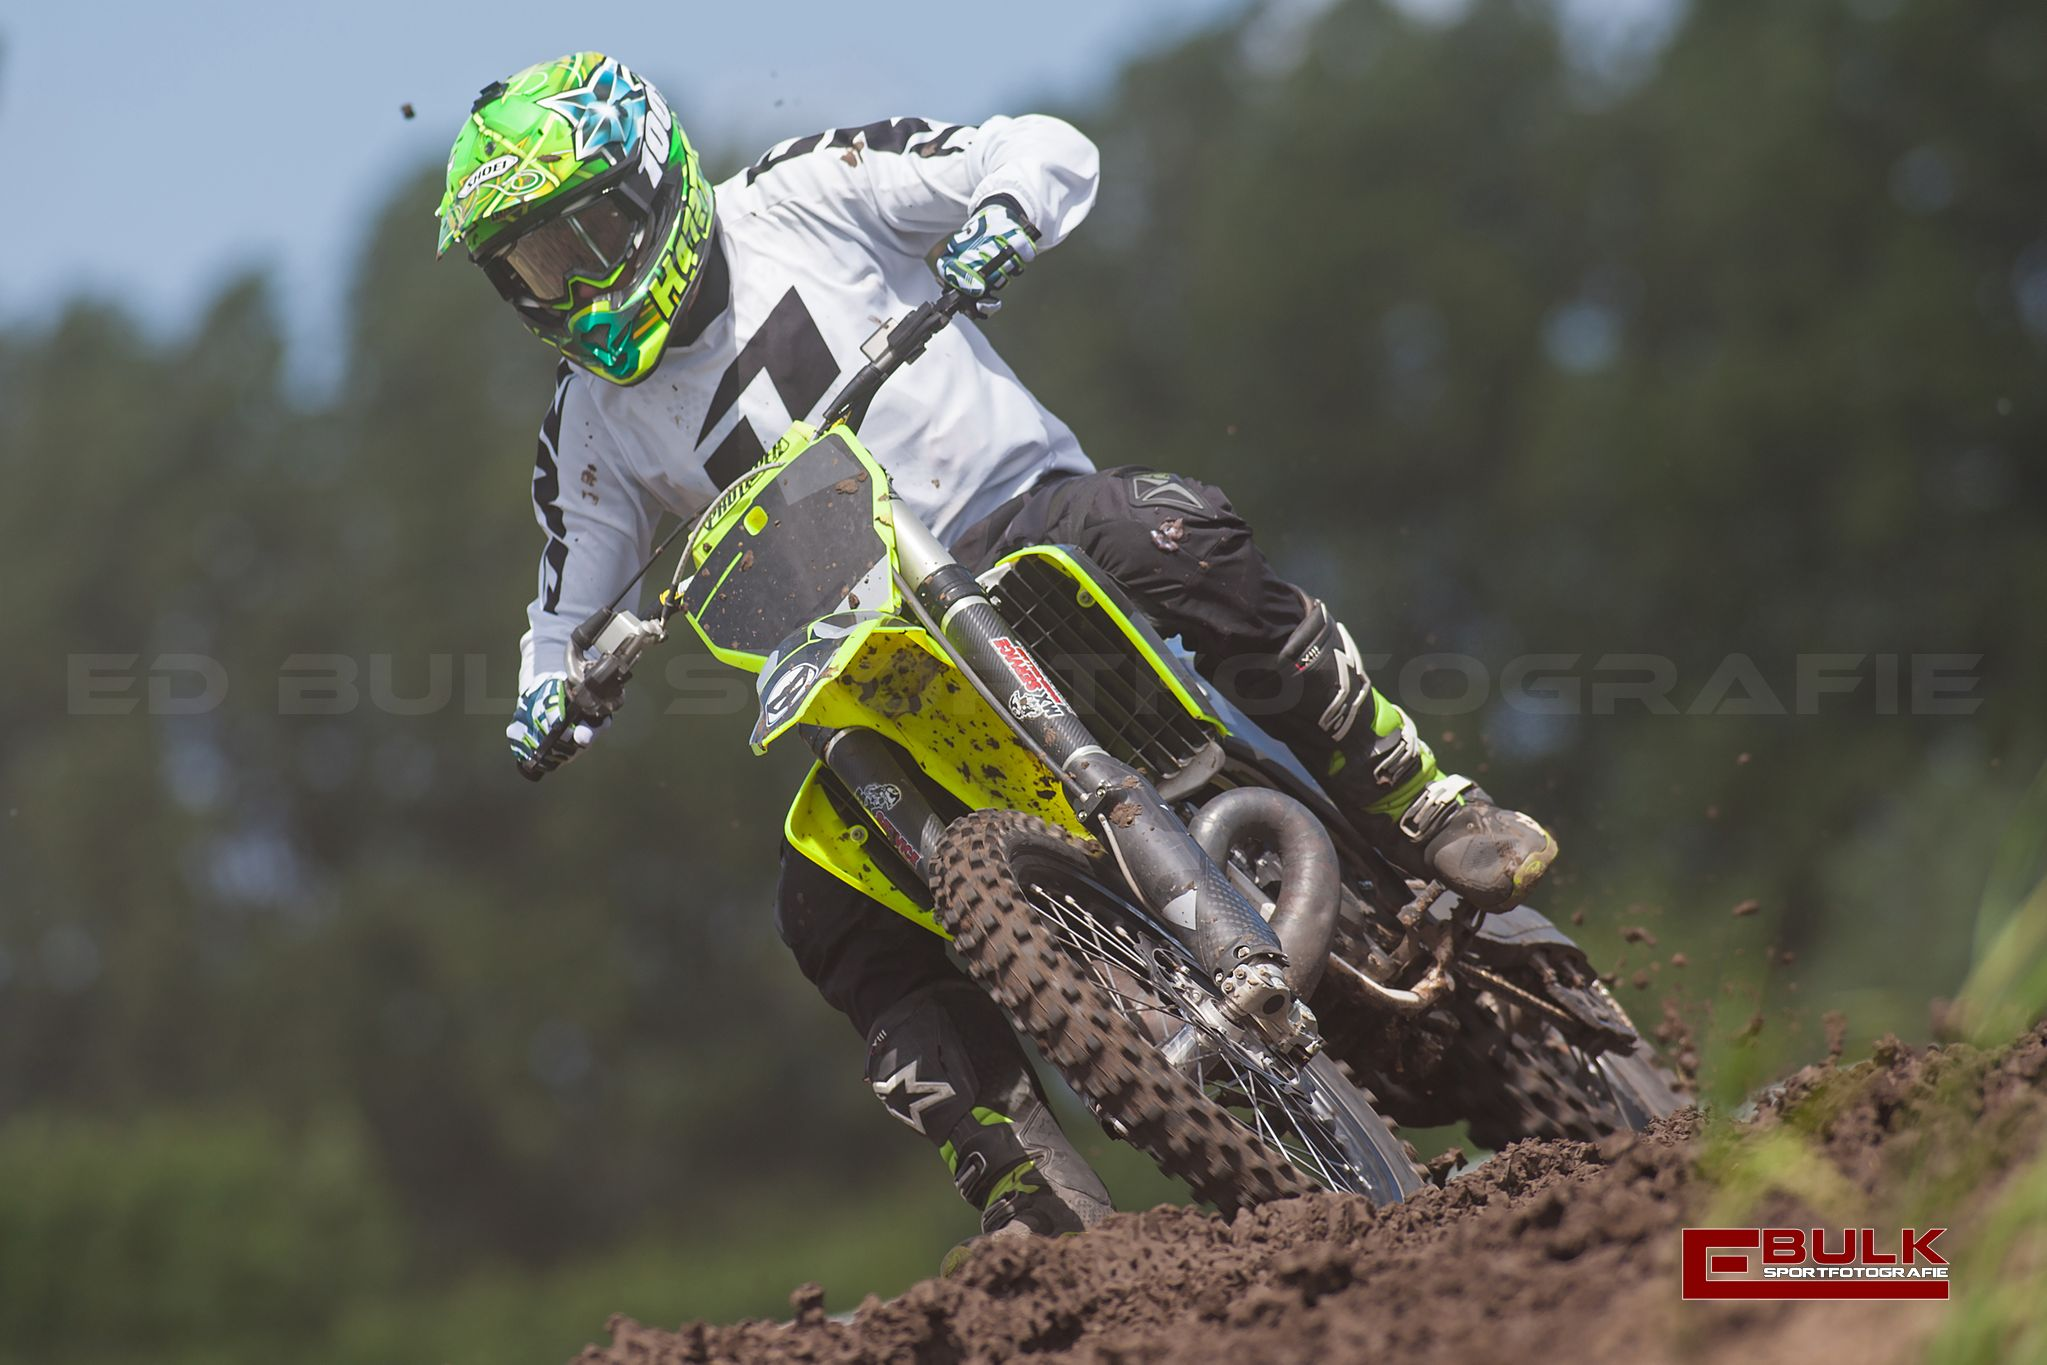 ebs_1776-ed_bulk_sportfotografie